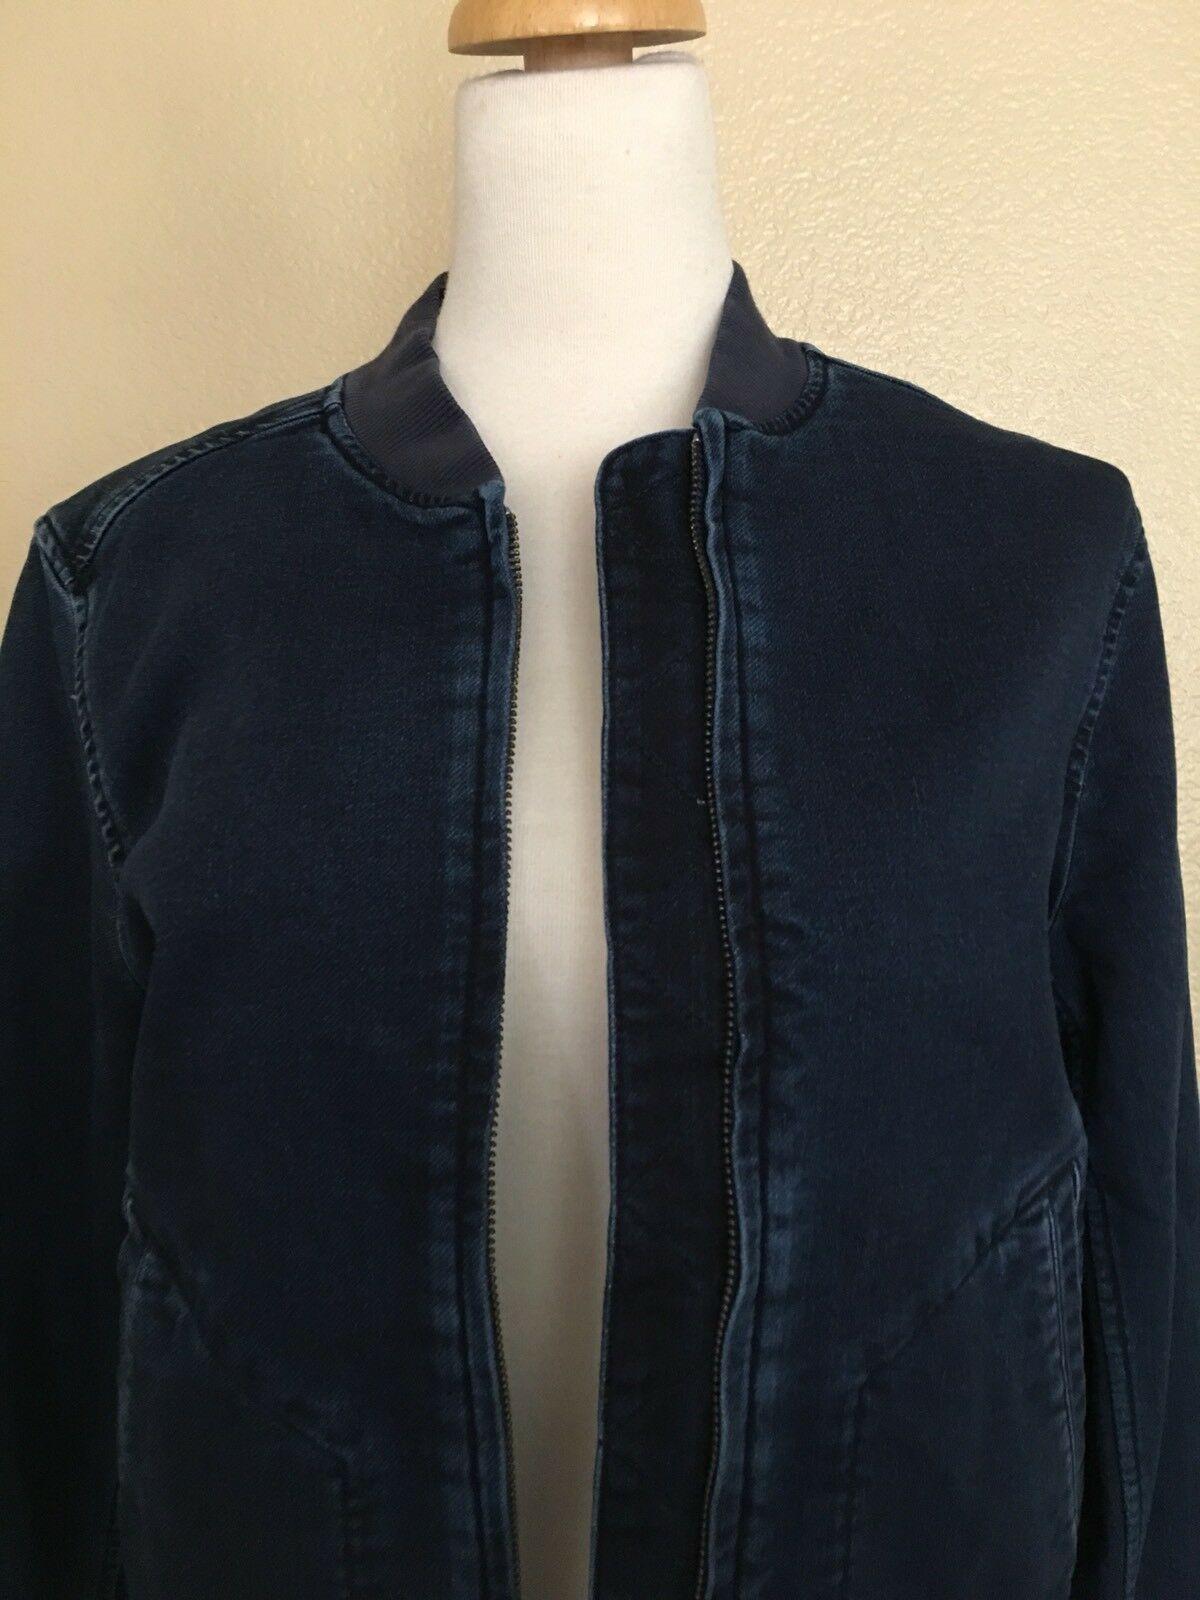 NWT Calvin Klein Knit Indigo Bomber Jacket, Size Medium, $178